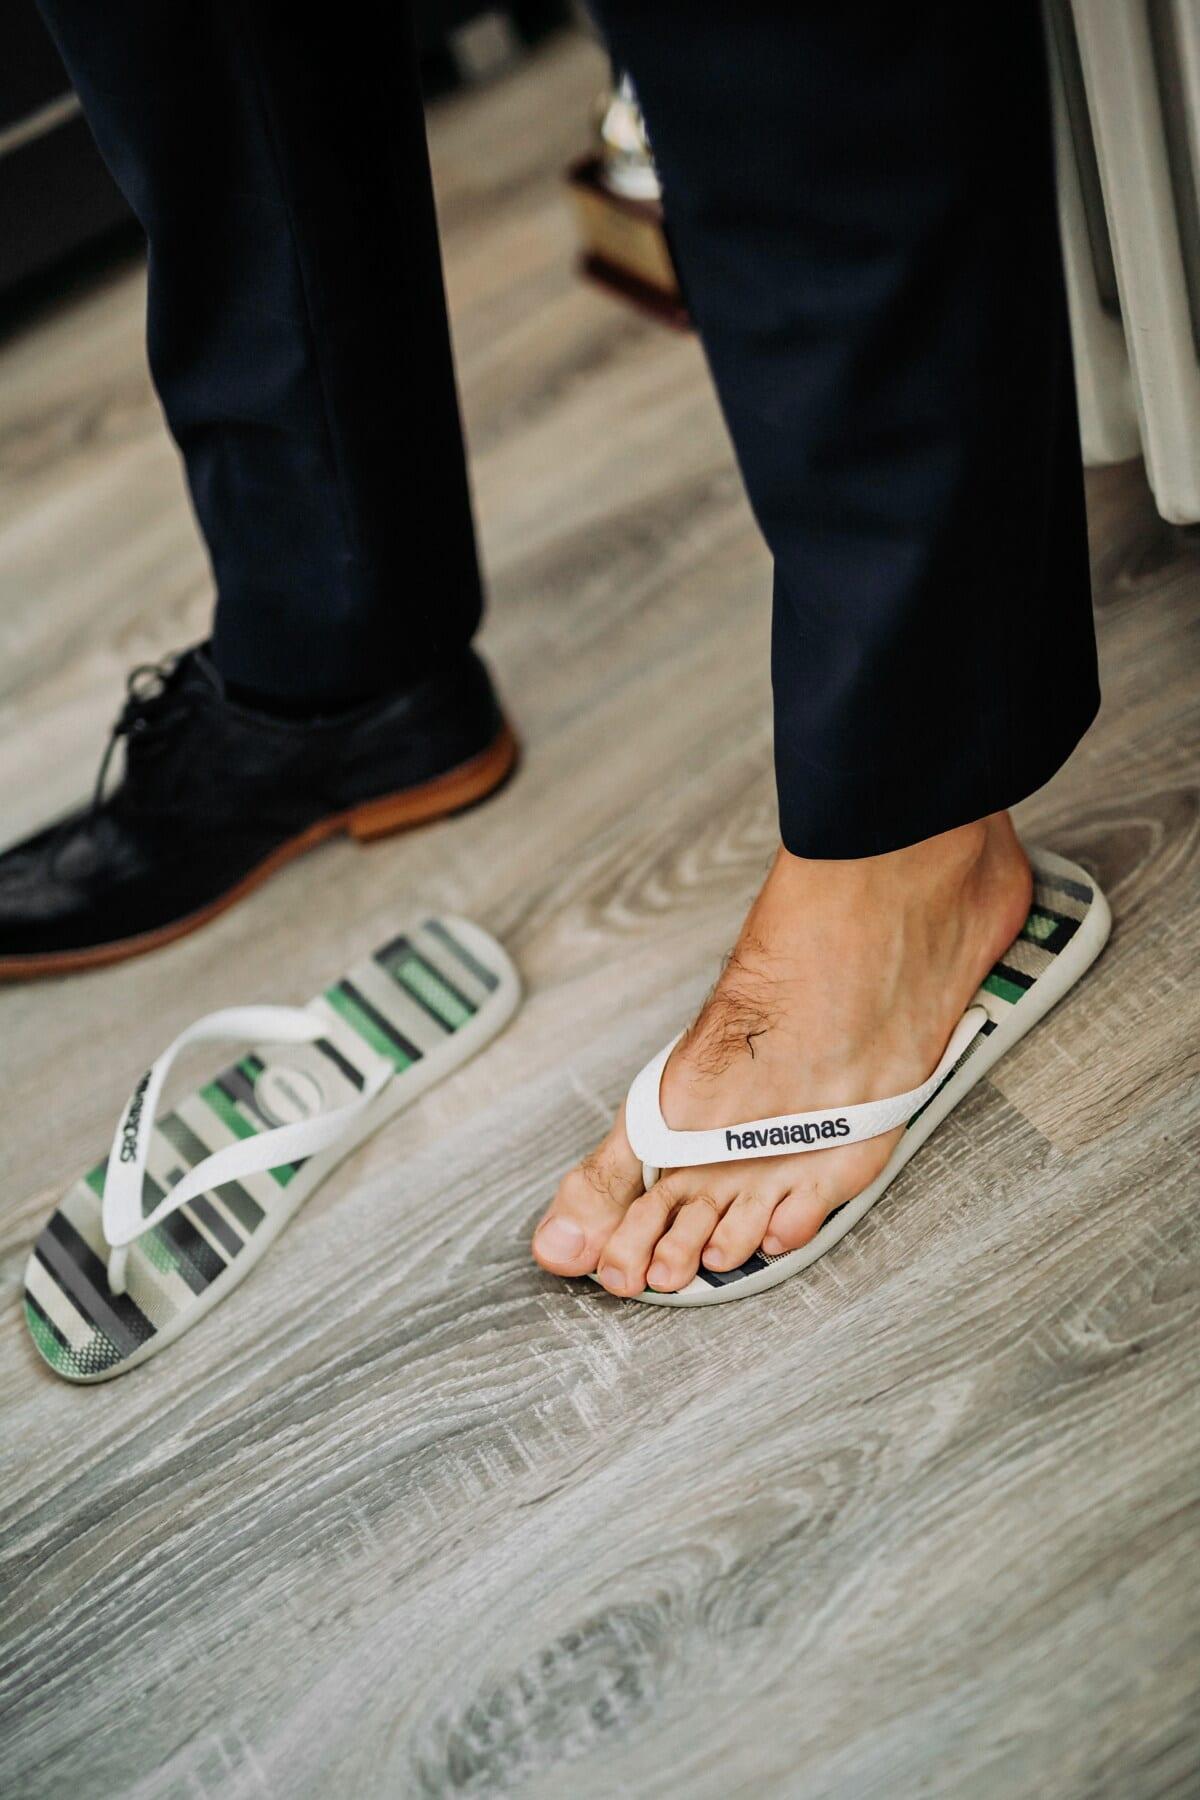 Mann, Fuß, stehende, barfuß, Schuhe, Hausschuhe, gemütlich, Schuh, Mode, Leder